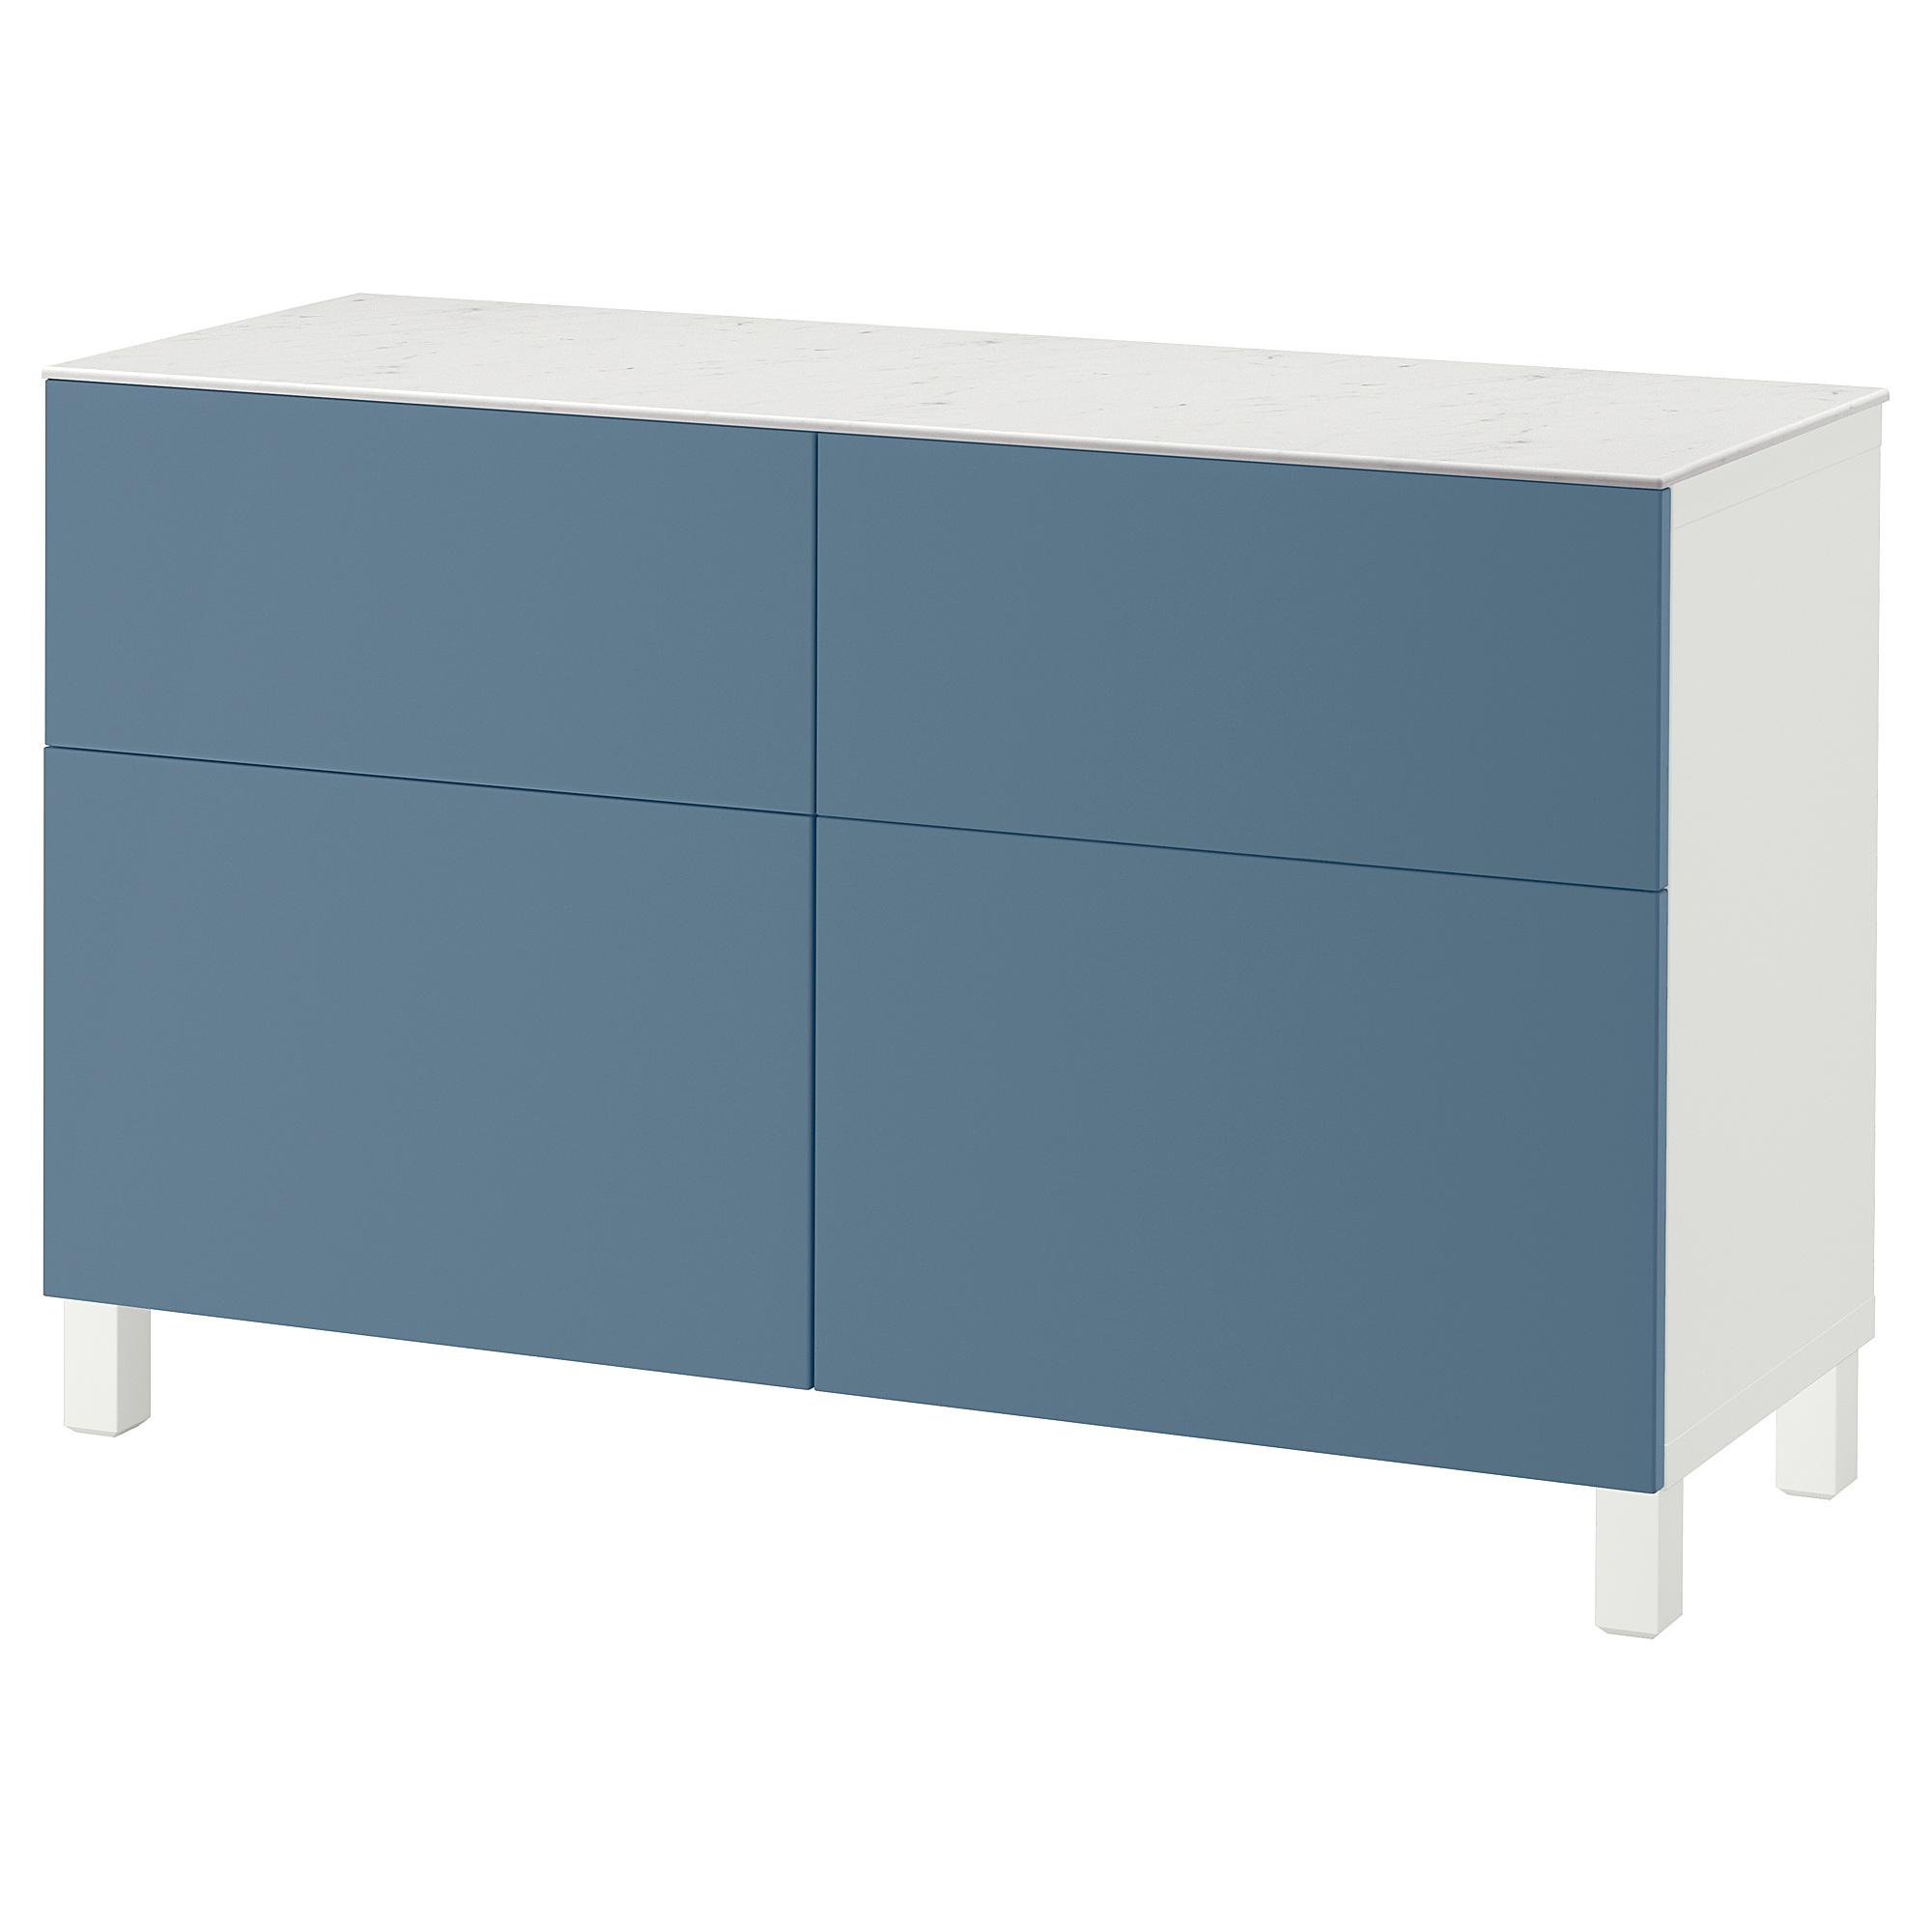 Комбинация для хранения с дверцами, ящиками БЕСТО темно-синий артикуль № 392.447.09 в наличии. Online сайт IKEA РБ. Недорогая доставка и монтаж.